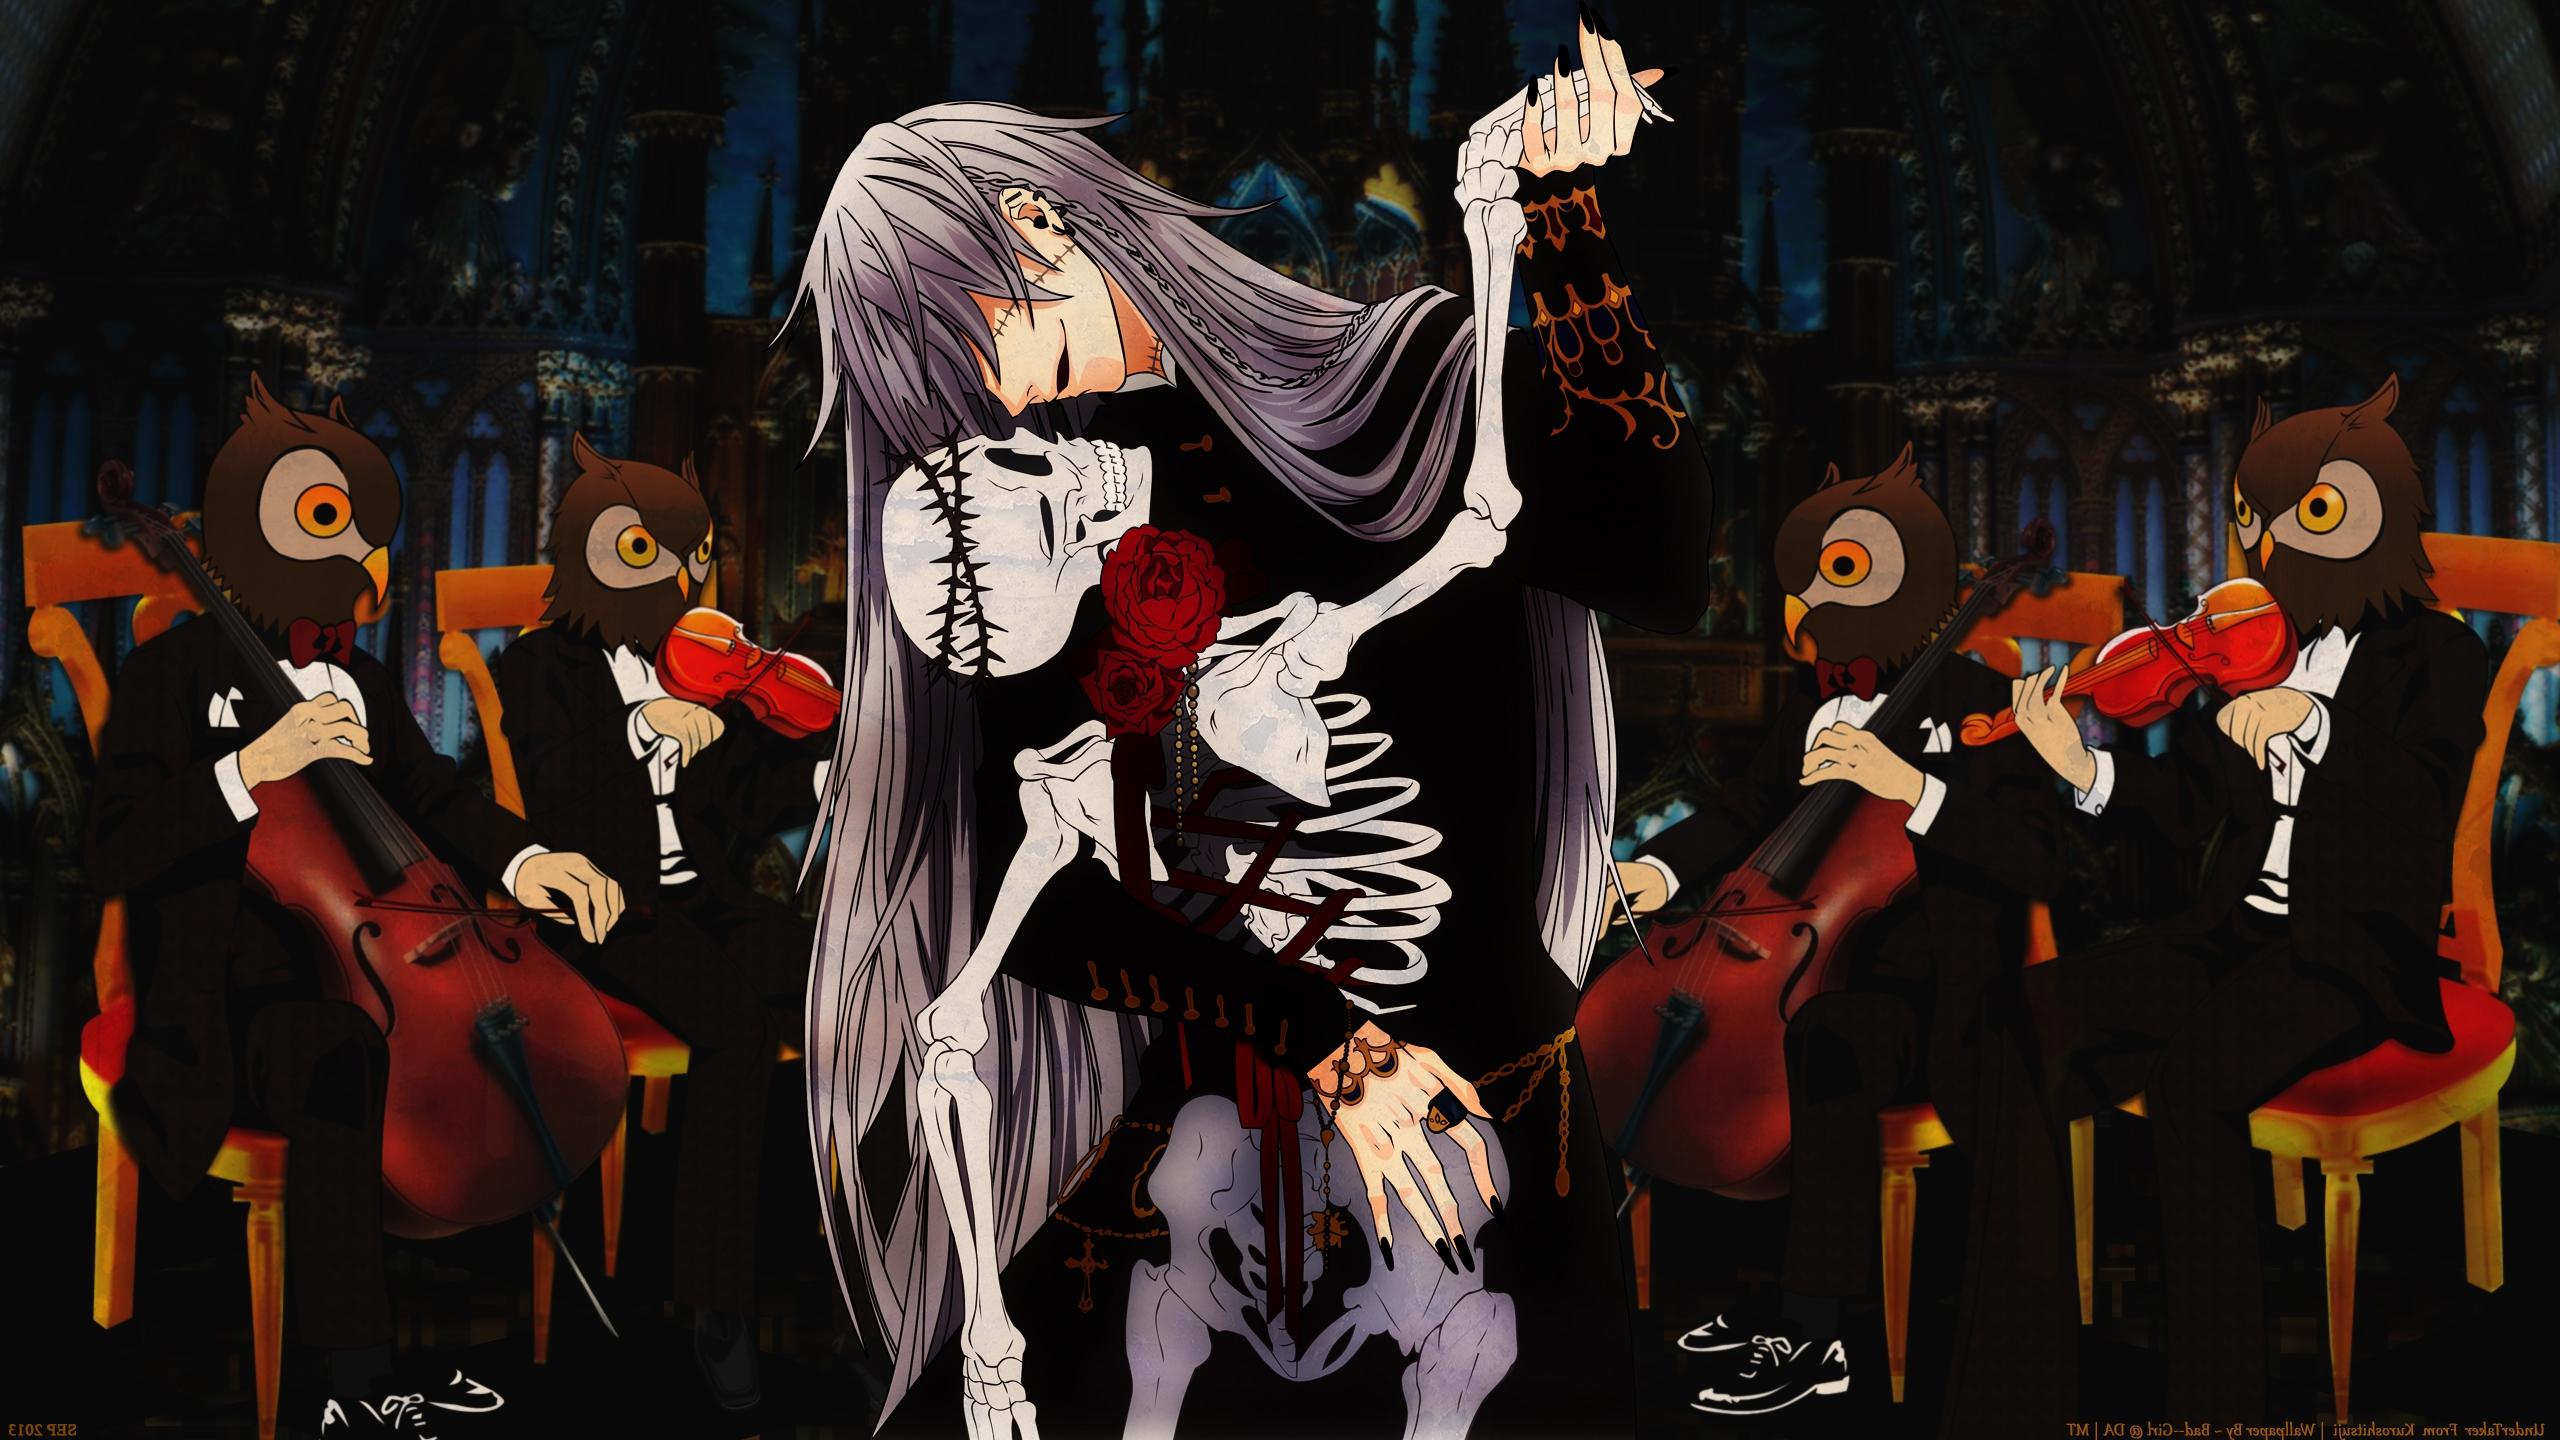 2560x1440 Px Cello Flowers Kuroshitsuji Music Rose Skull Undertaker Violin